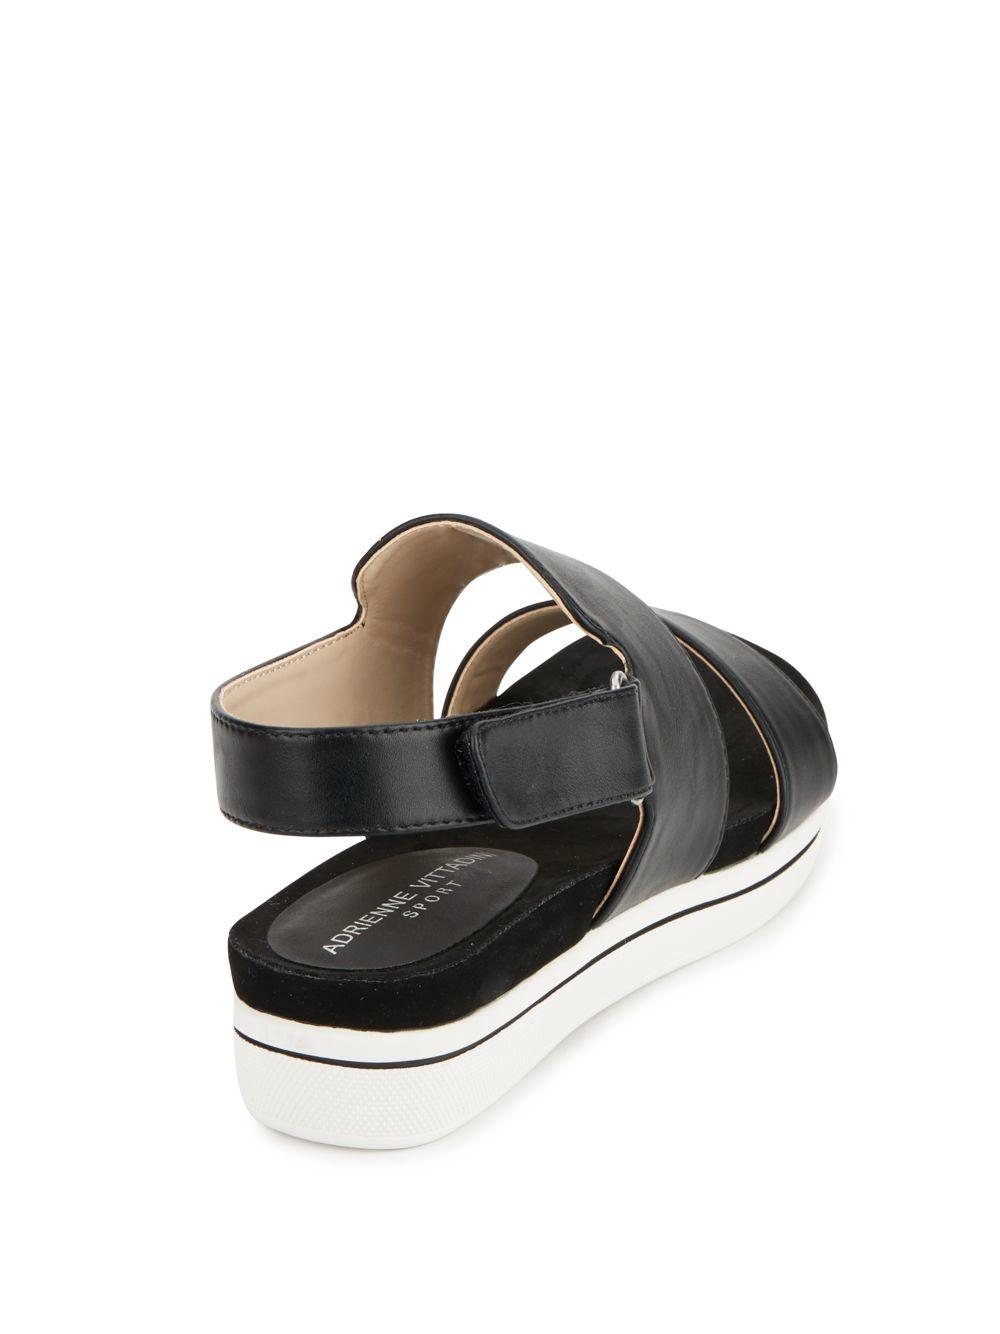 Adrienne Vittadini Sport Chuckie Leather Sandals In Black